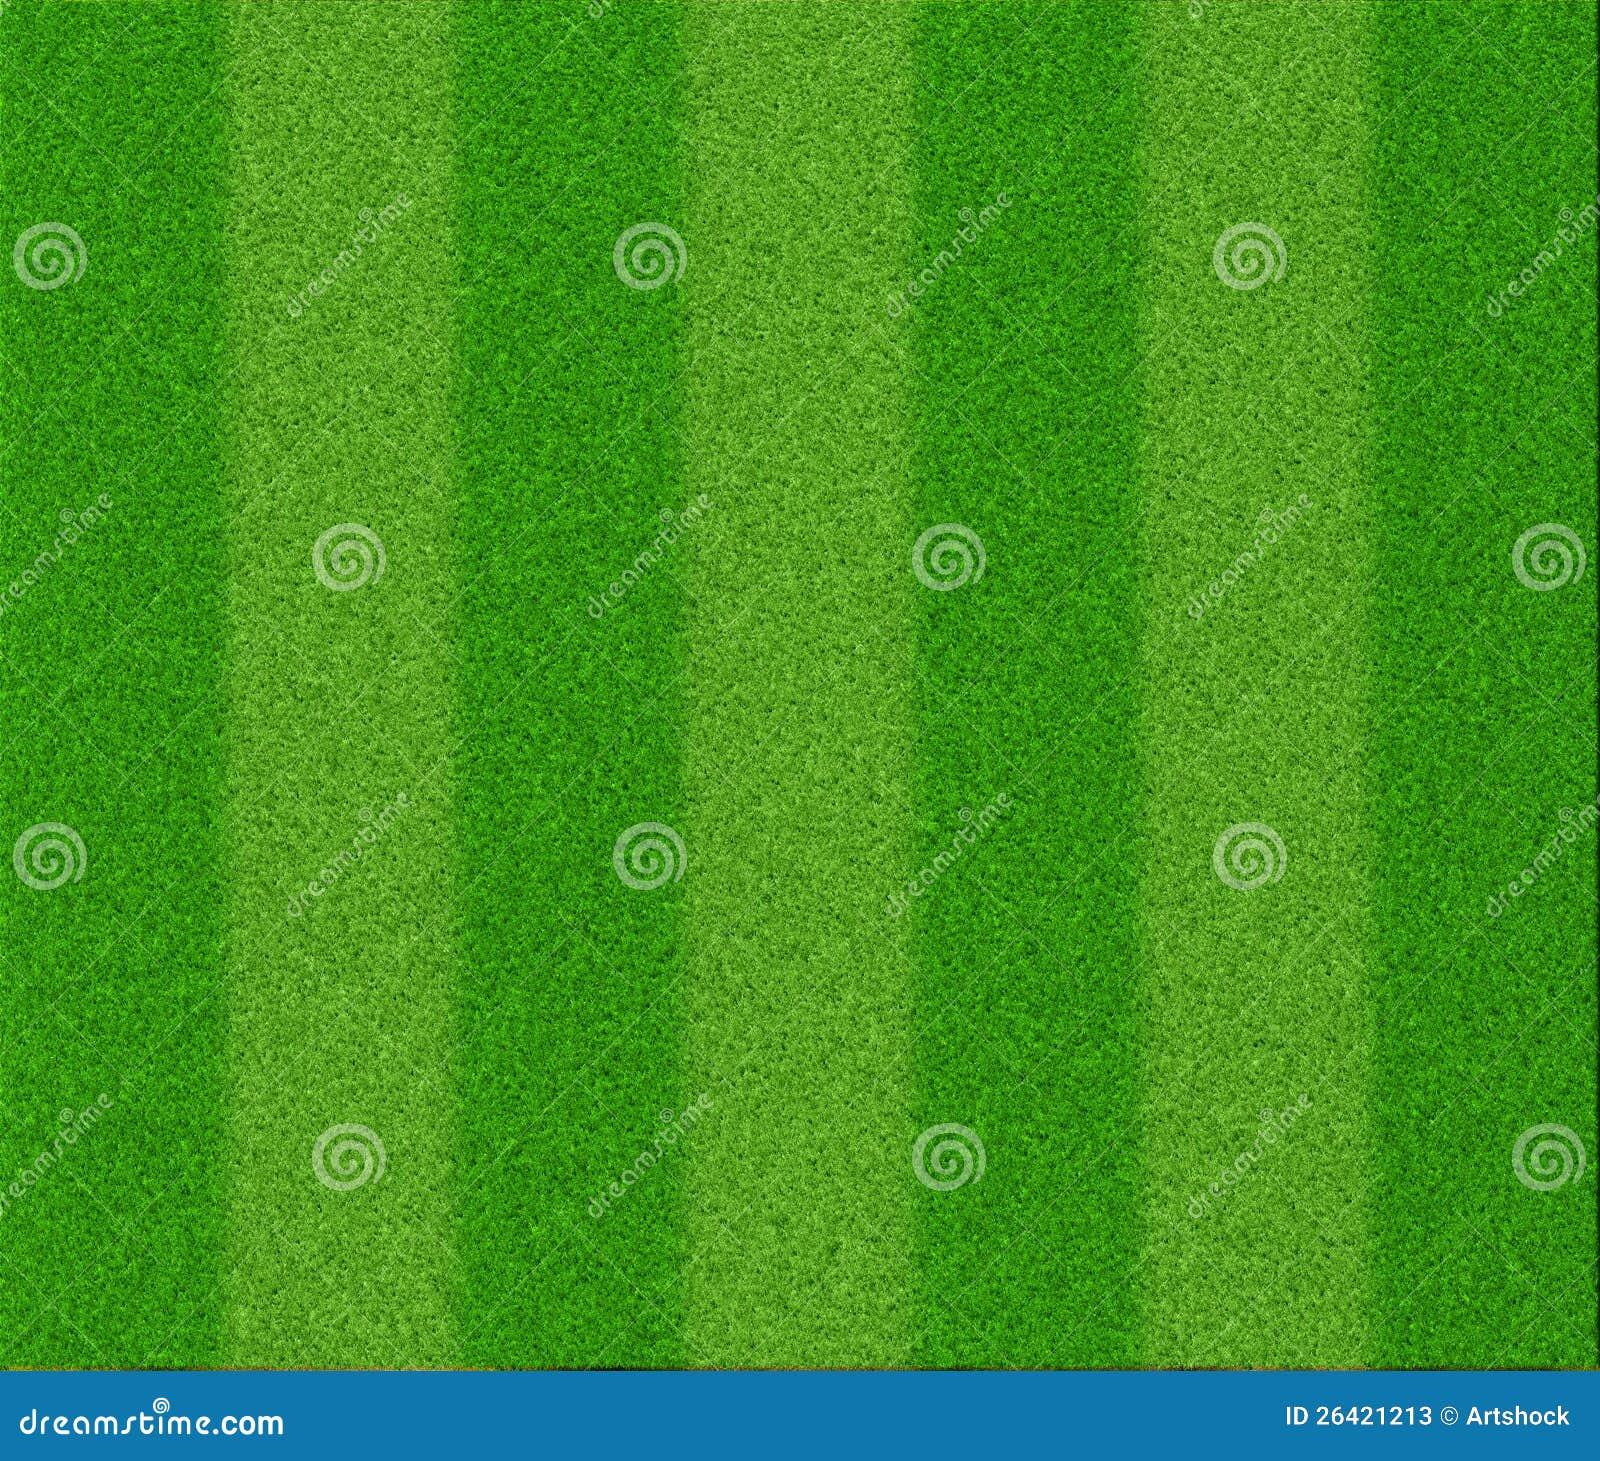 Textura da grama do futebol